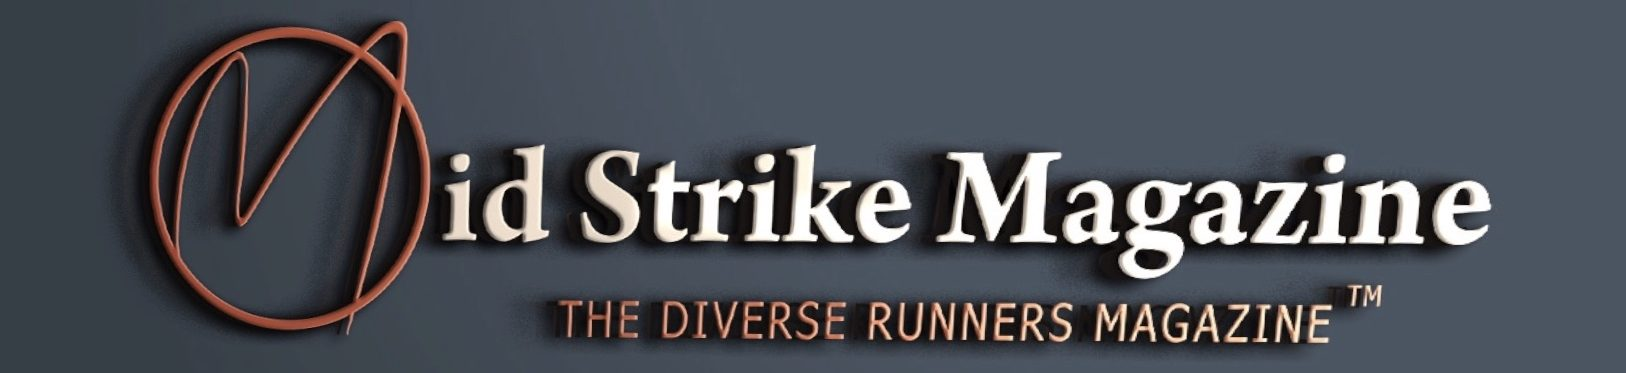 Mid Strike Magazine